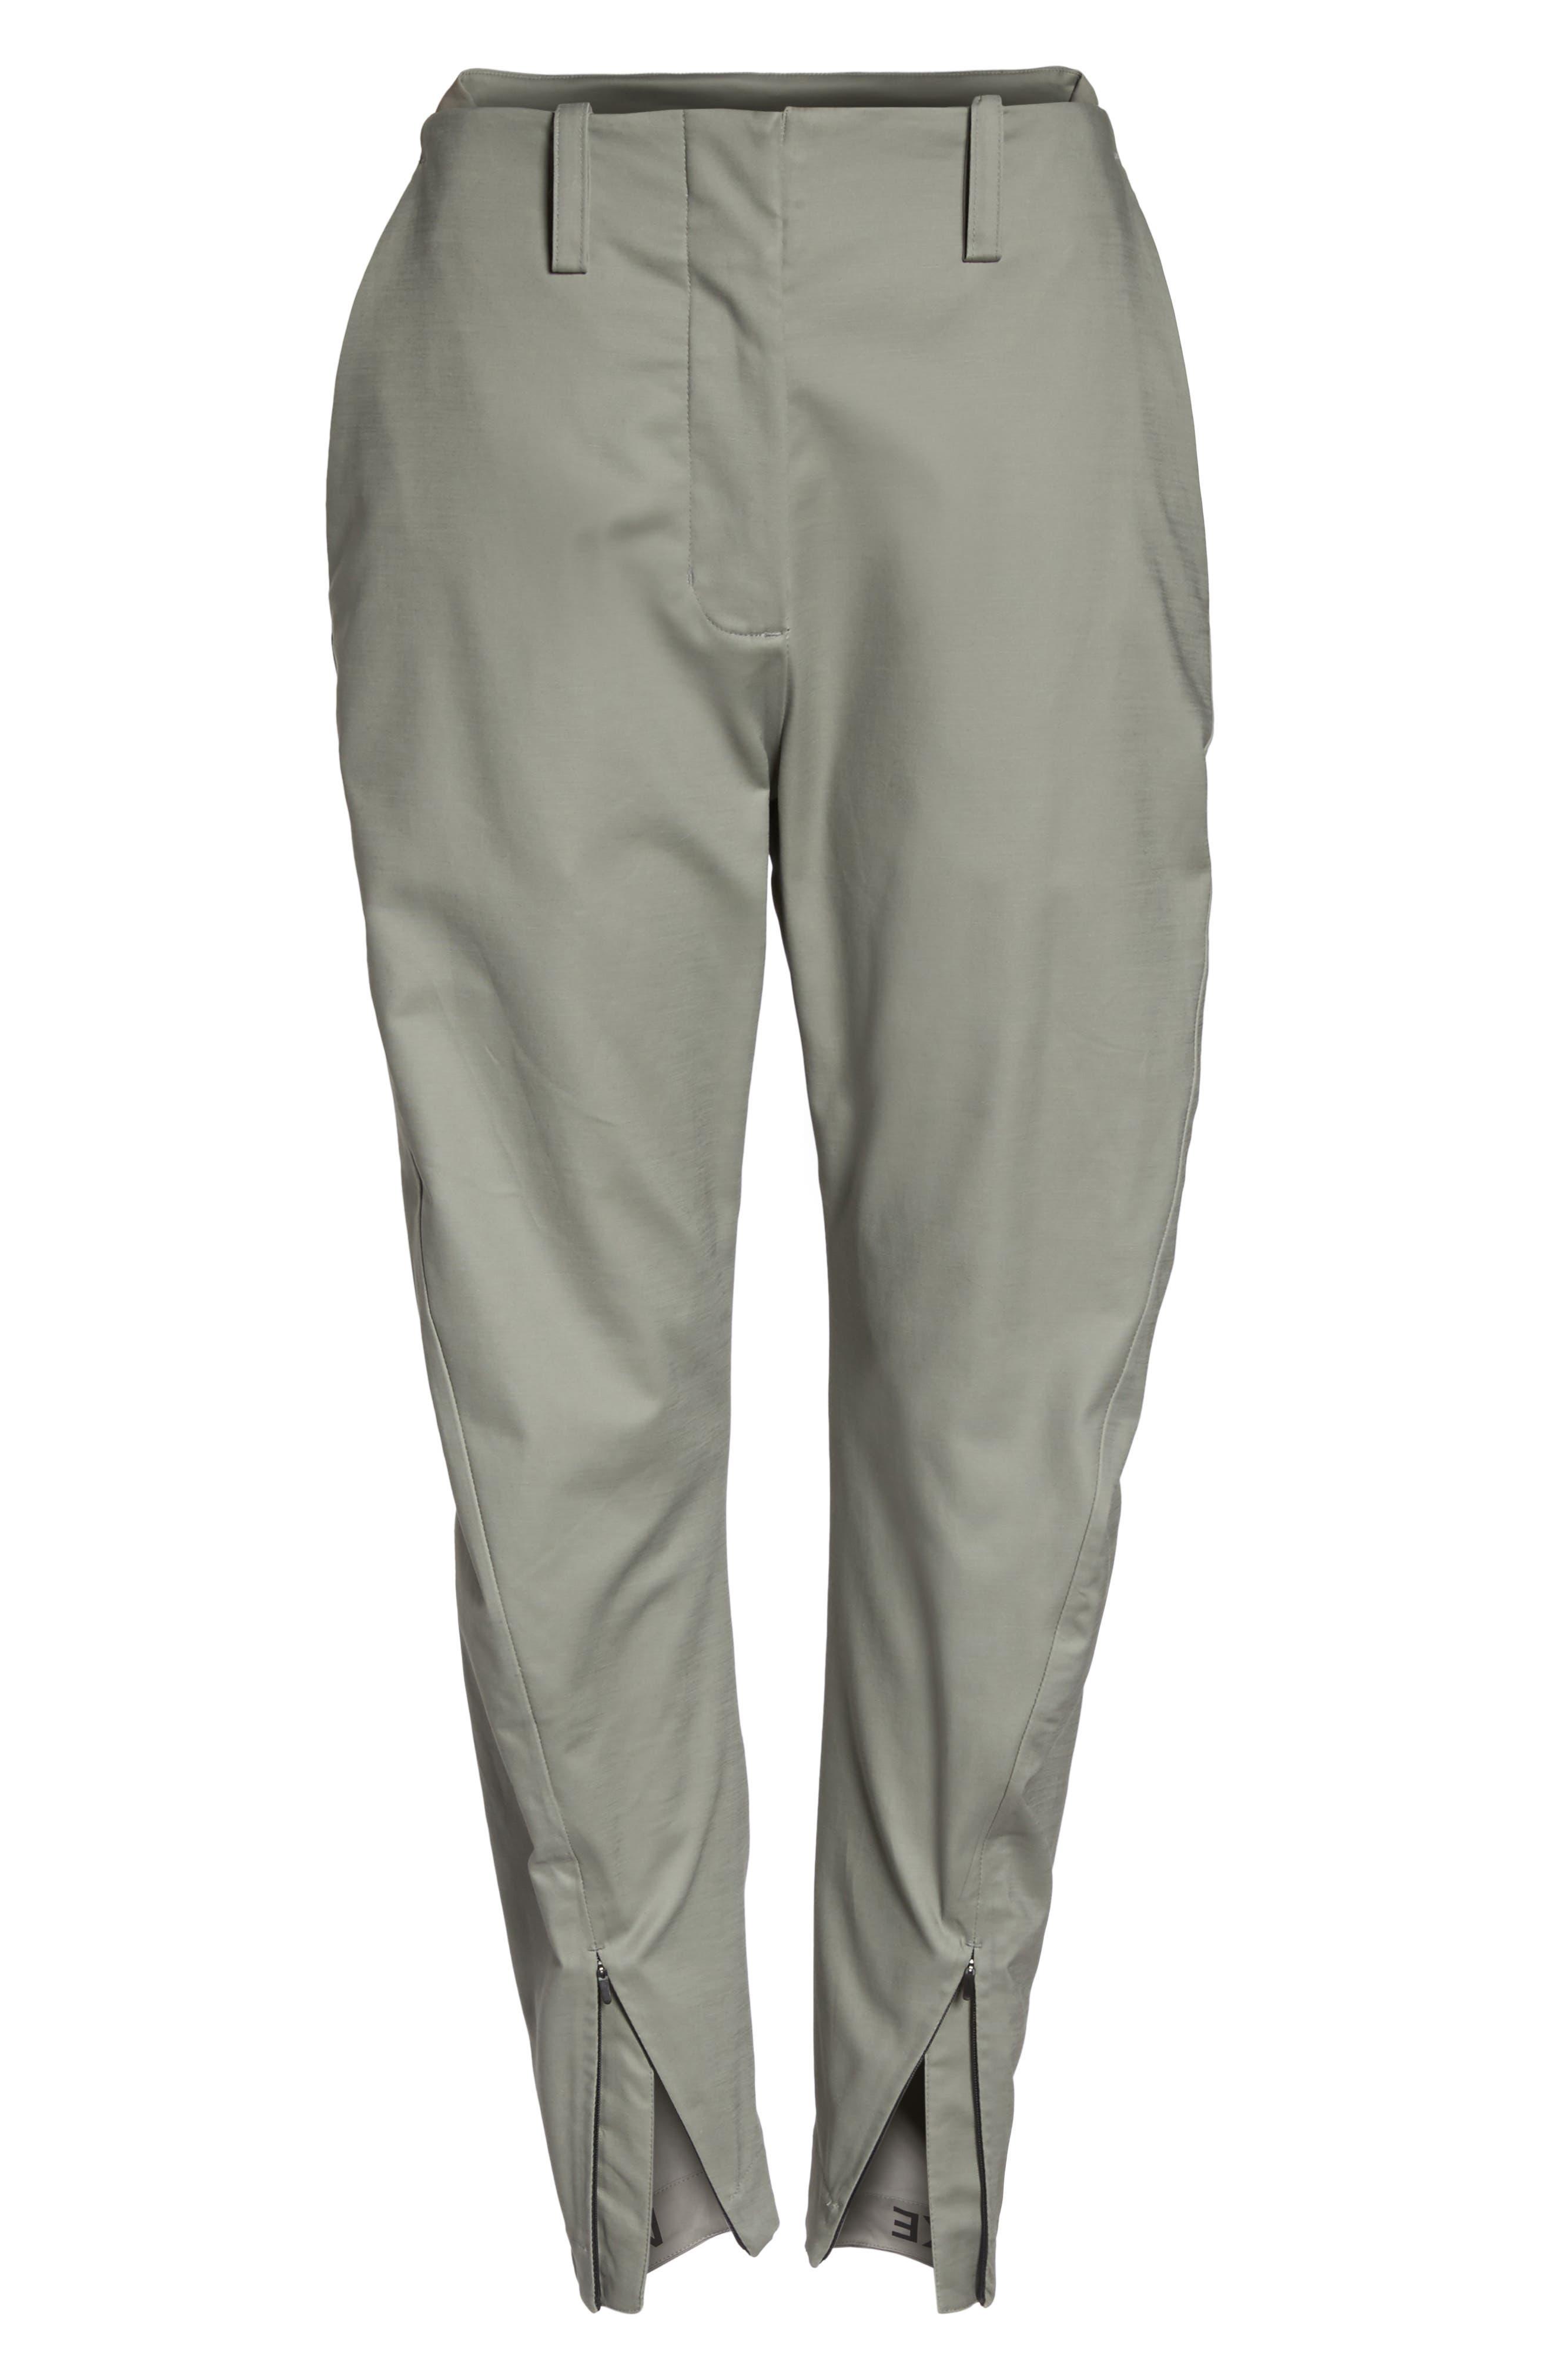 NikeLab ACG Tech Woven Pants,                             Alternate thumbnail 4, color,                             020